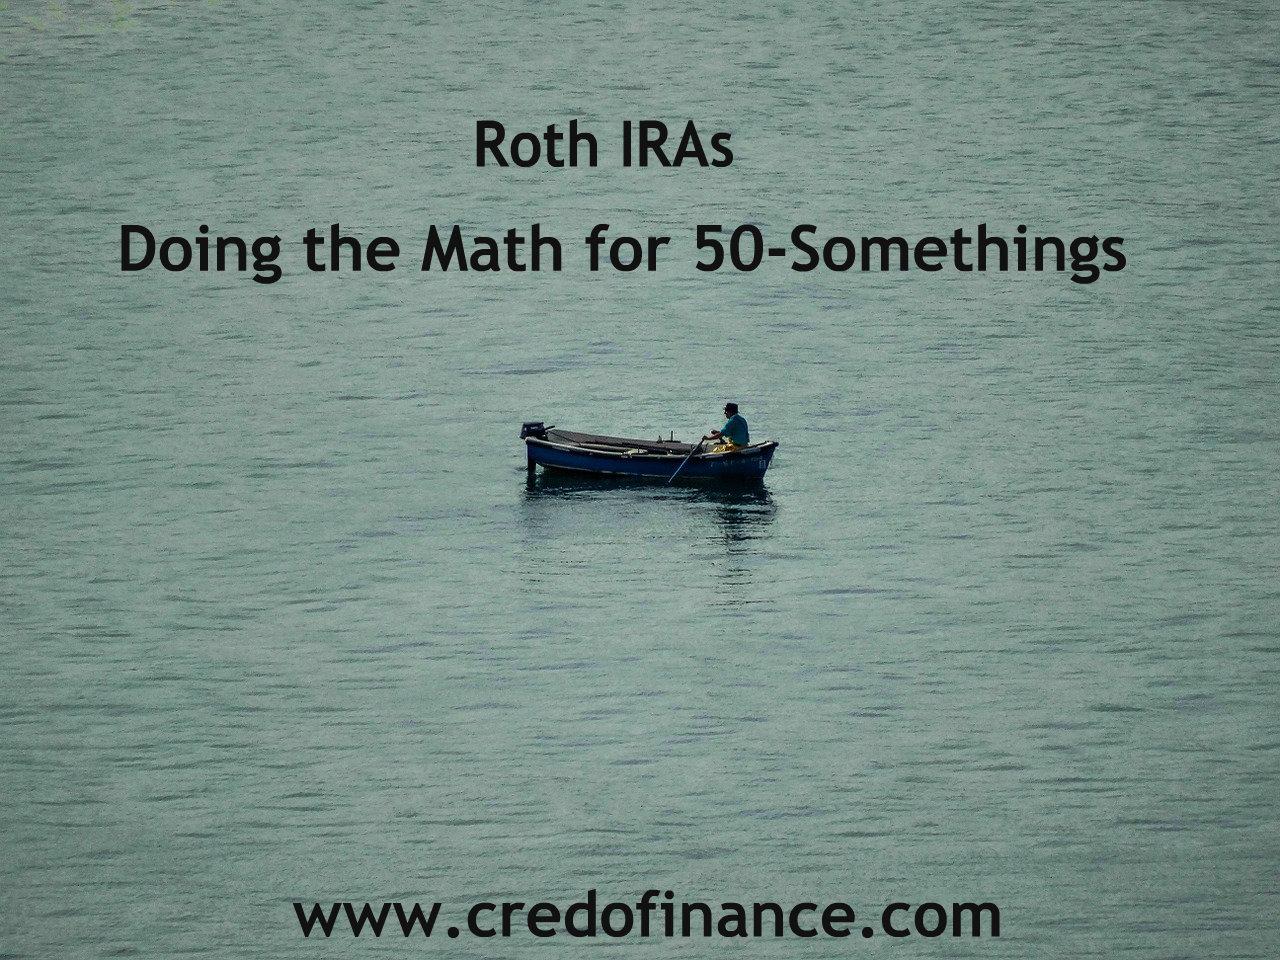 Roth IRA - Credo Finance